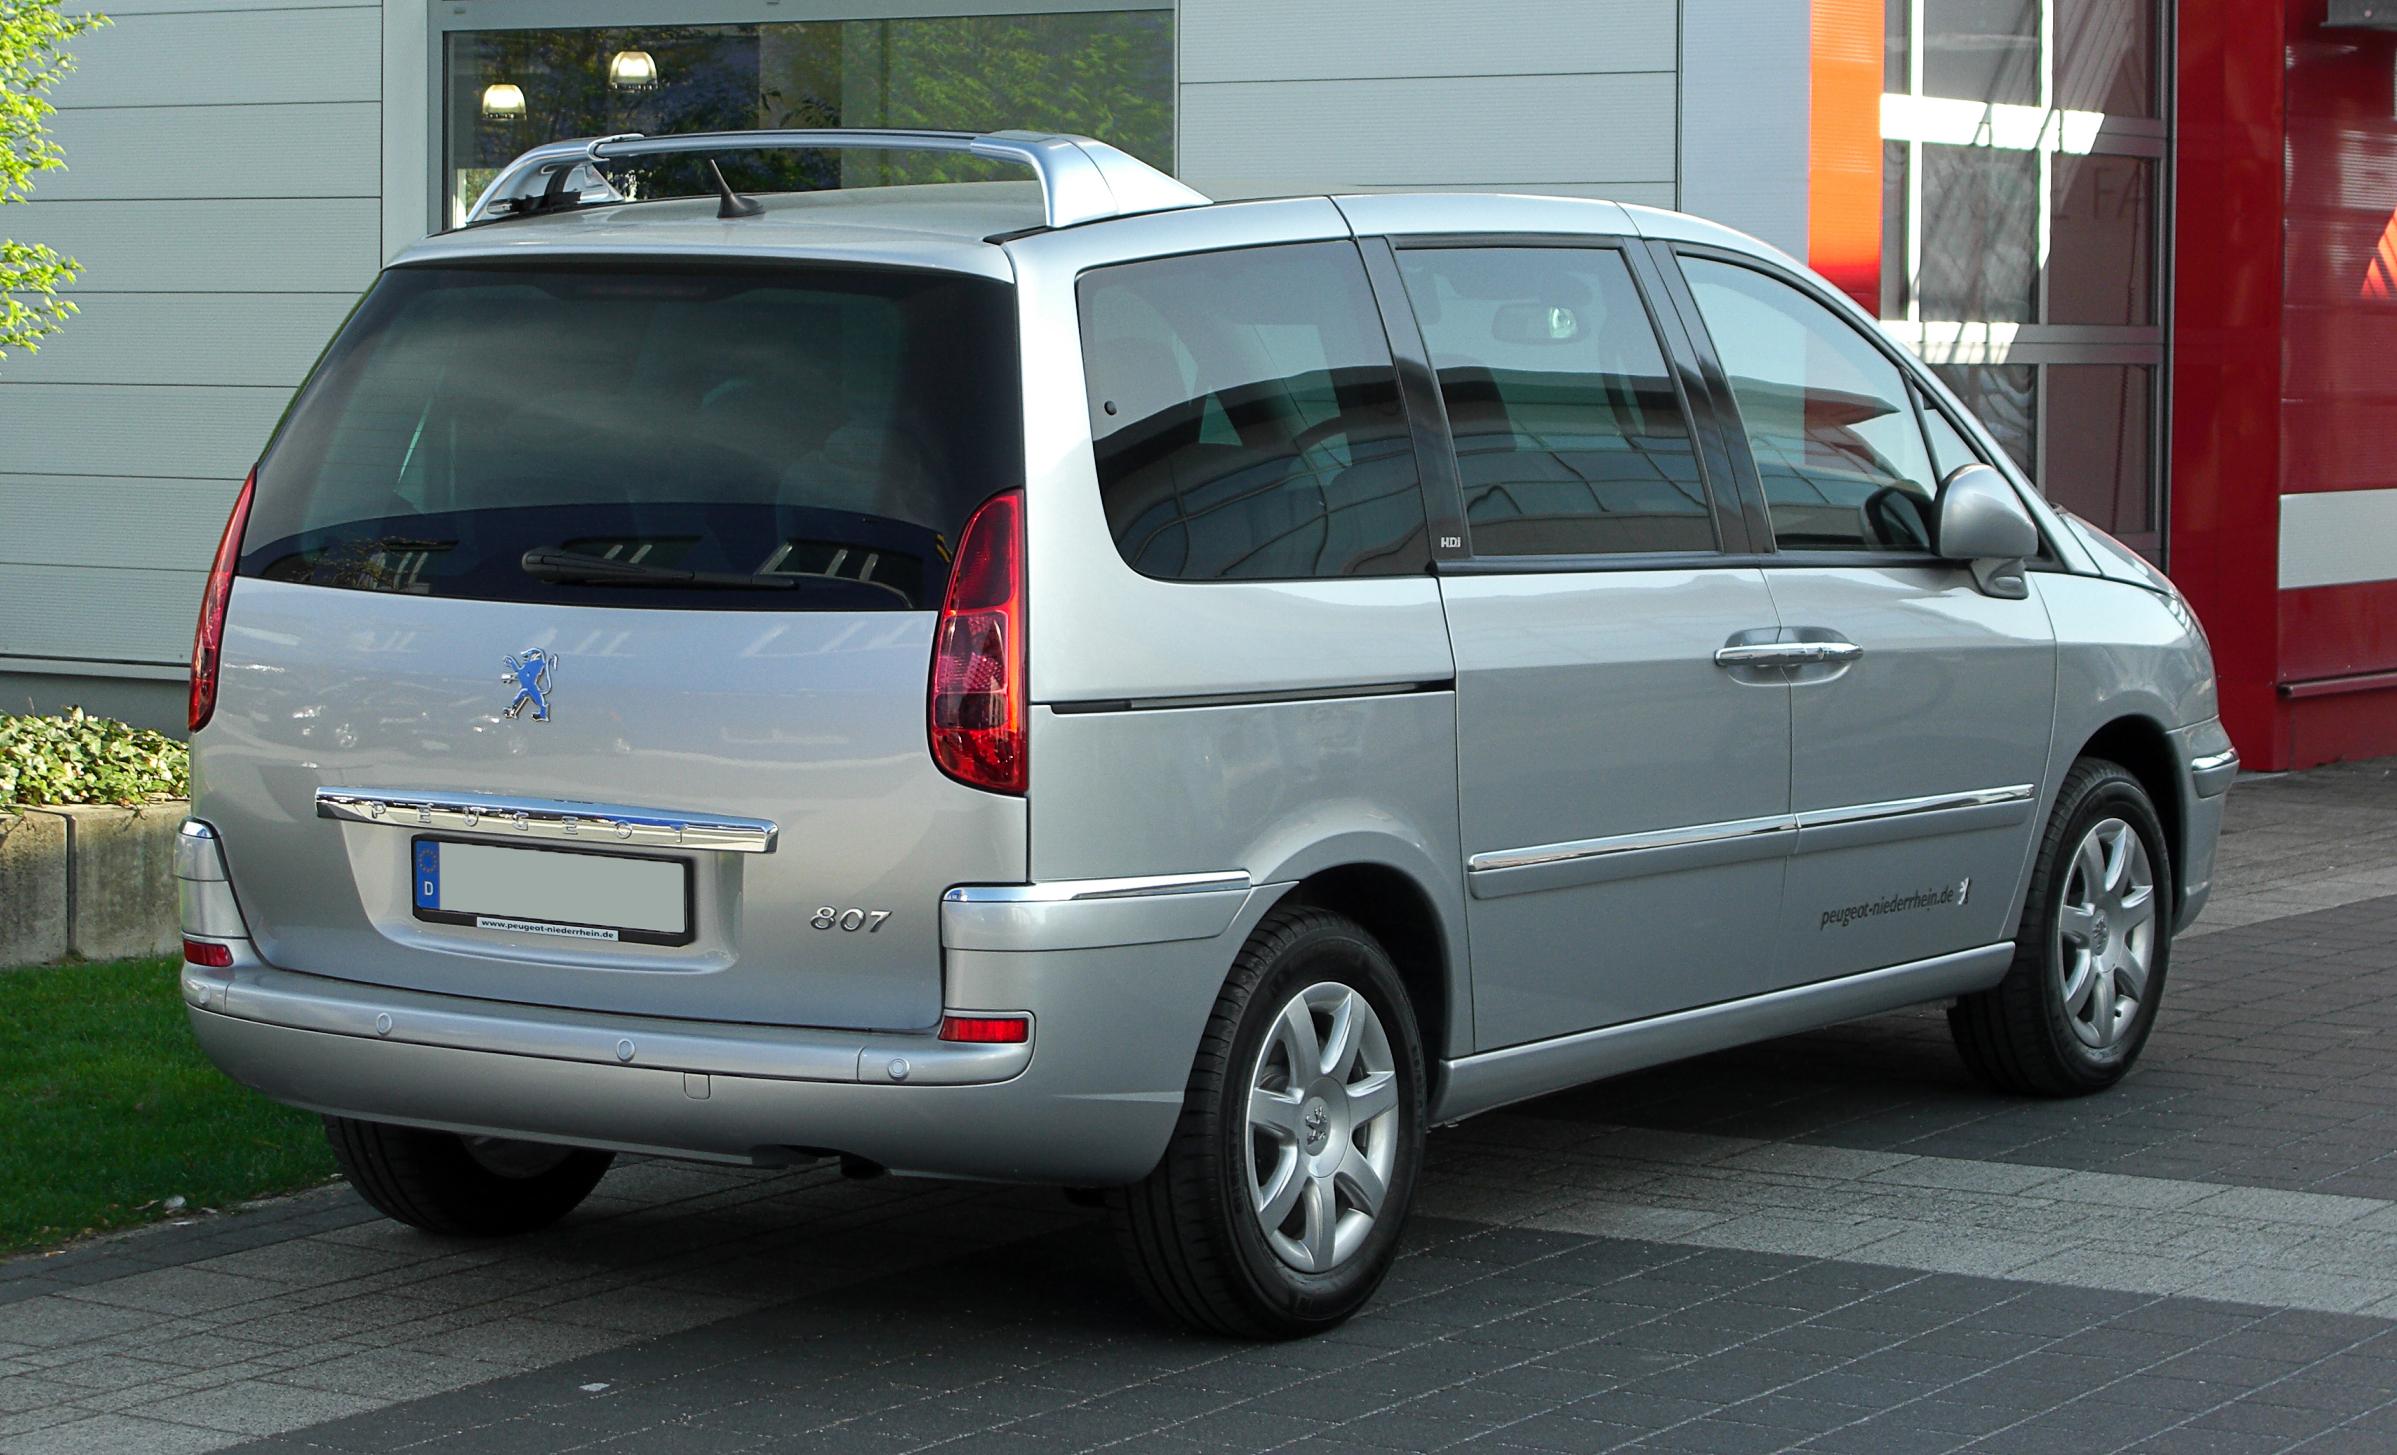 File:Peugeot 807 HDi FAP 135 Premium (Facelift) – Heckansicht, 9